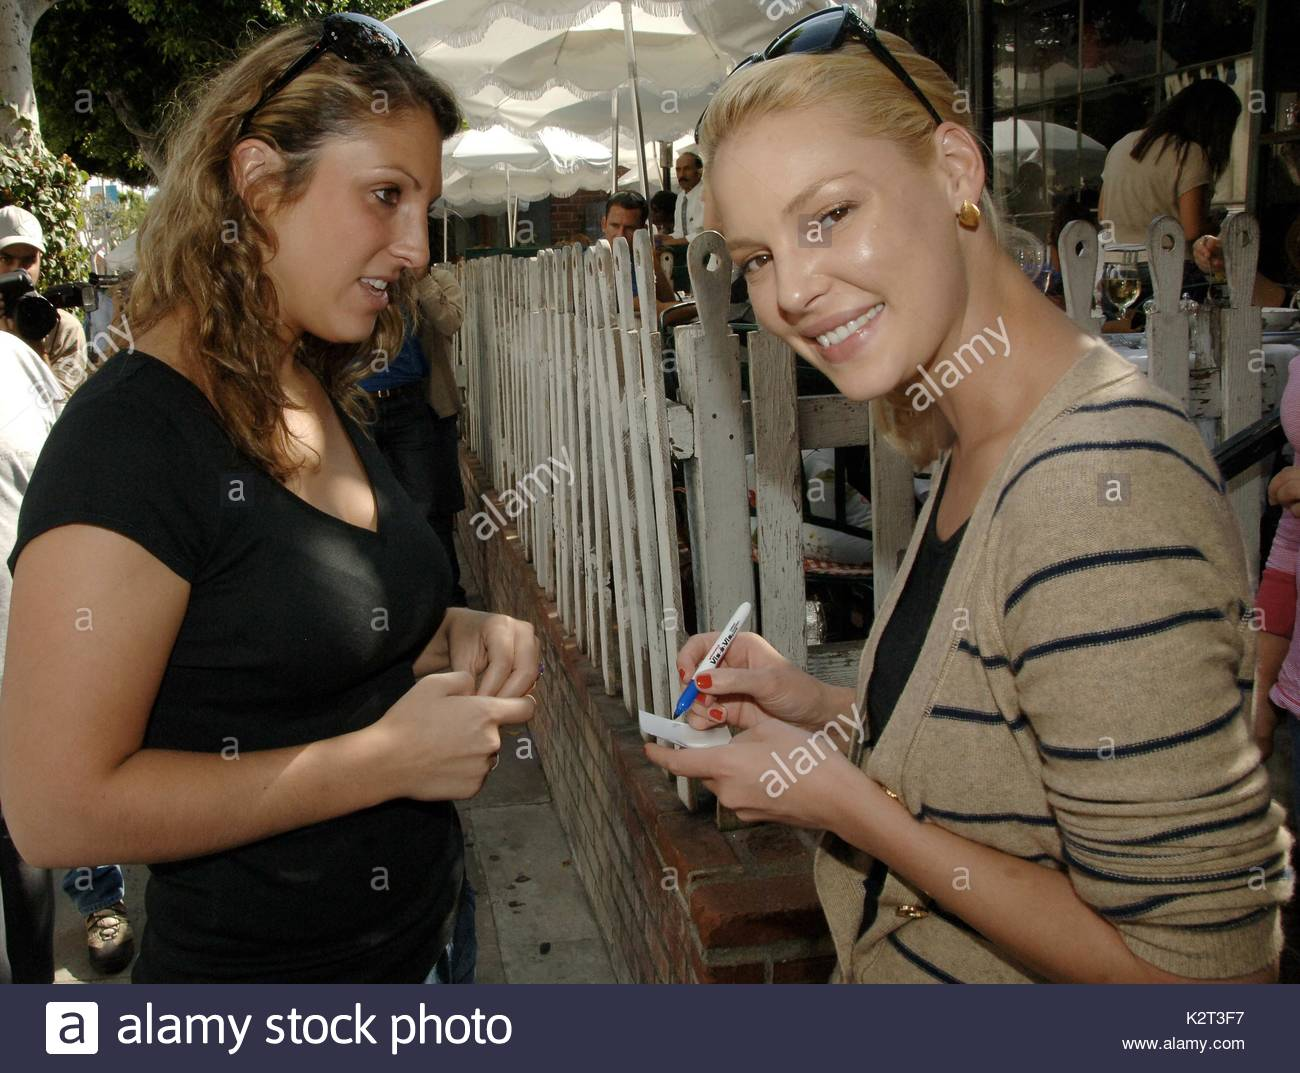 Katherine Heigl Of The Hit Television Show Greys Anatomy Who Won